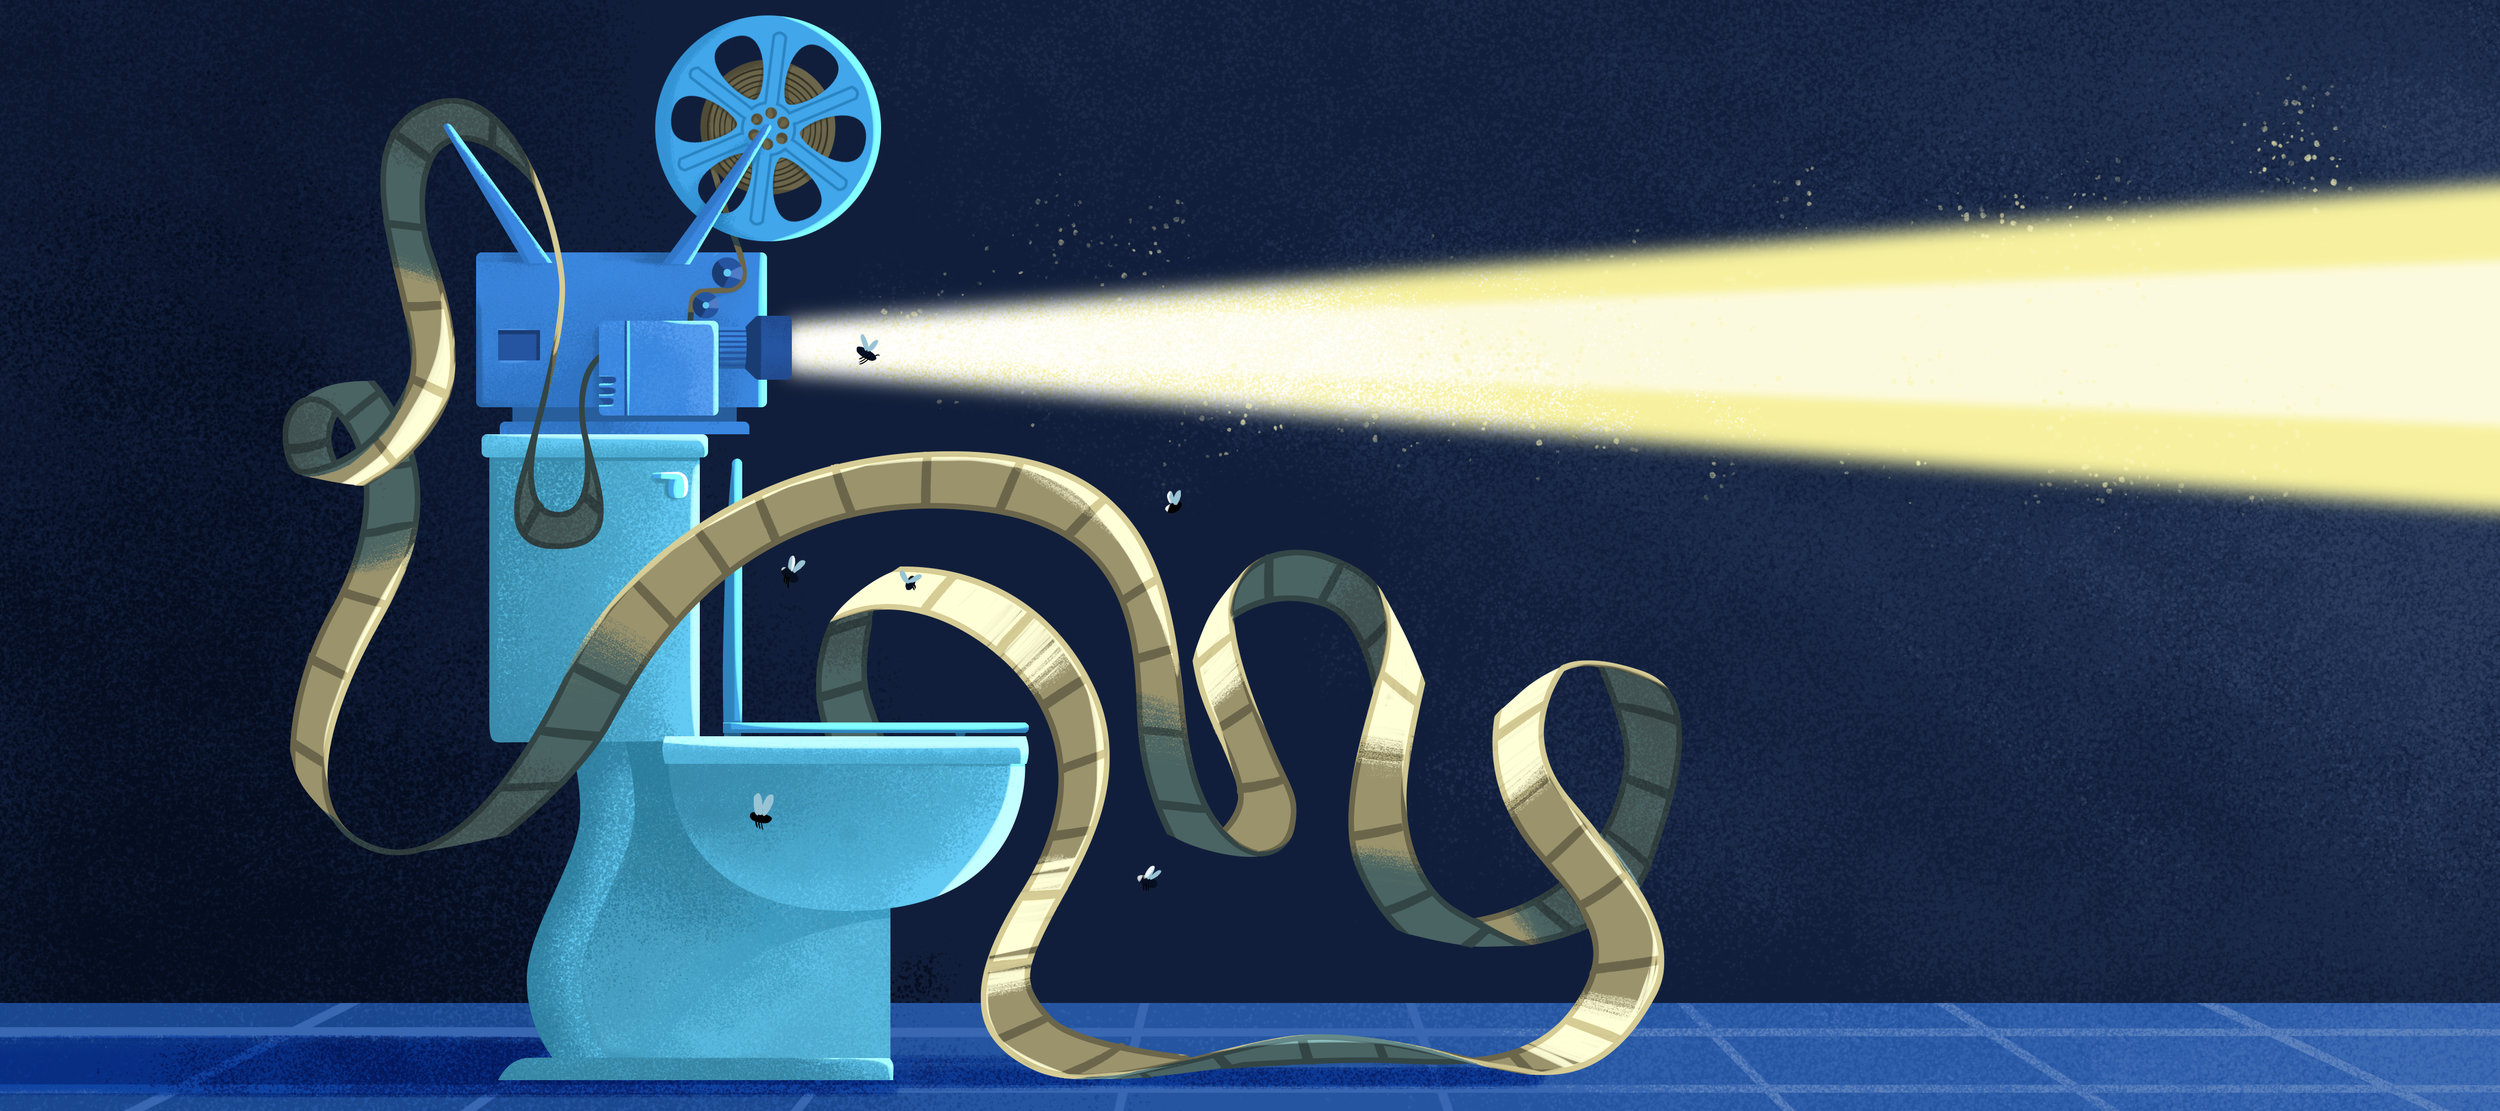 Box Office Bombs